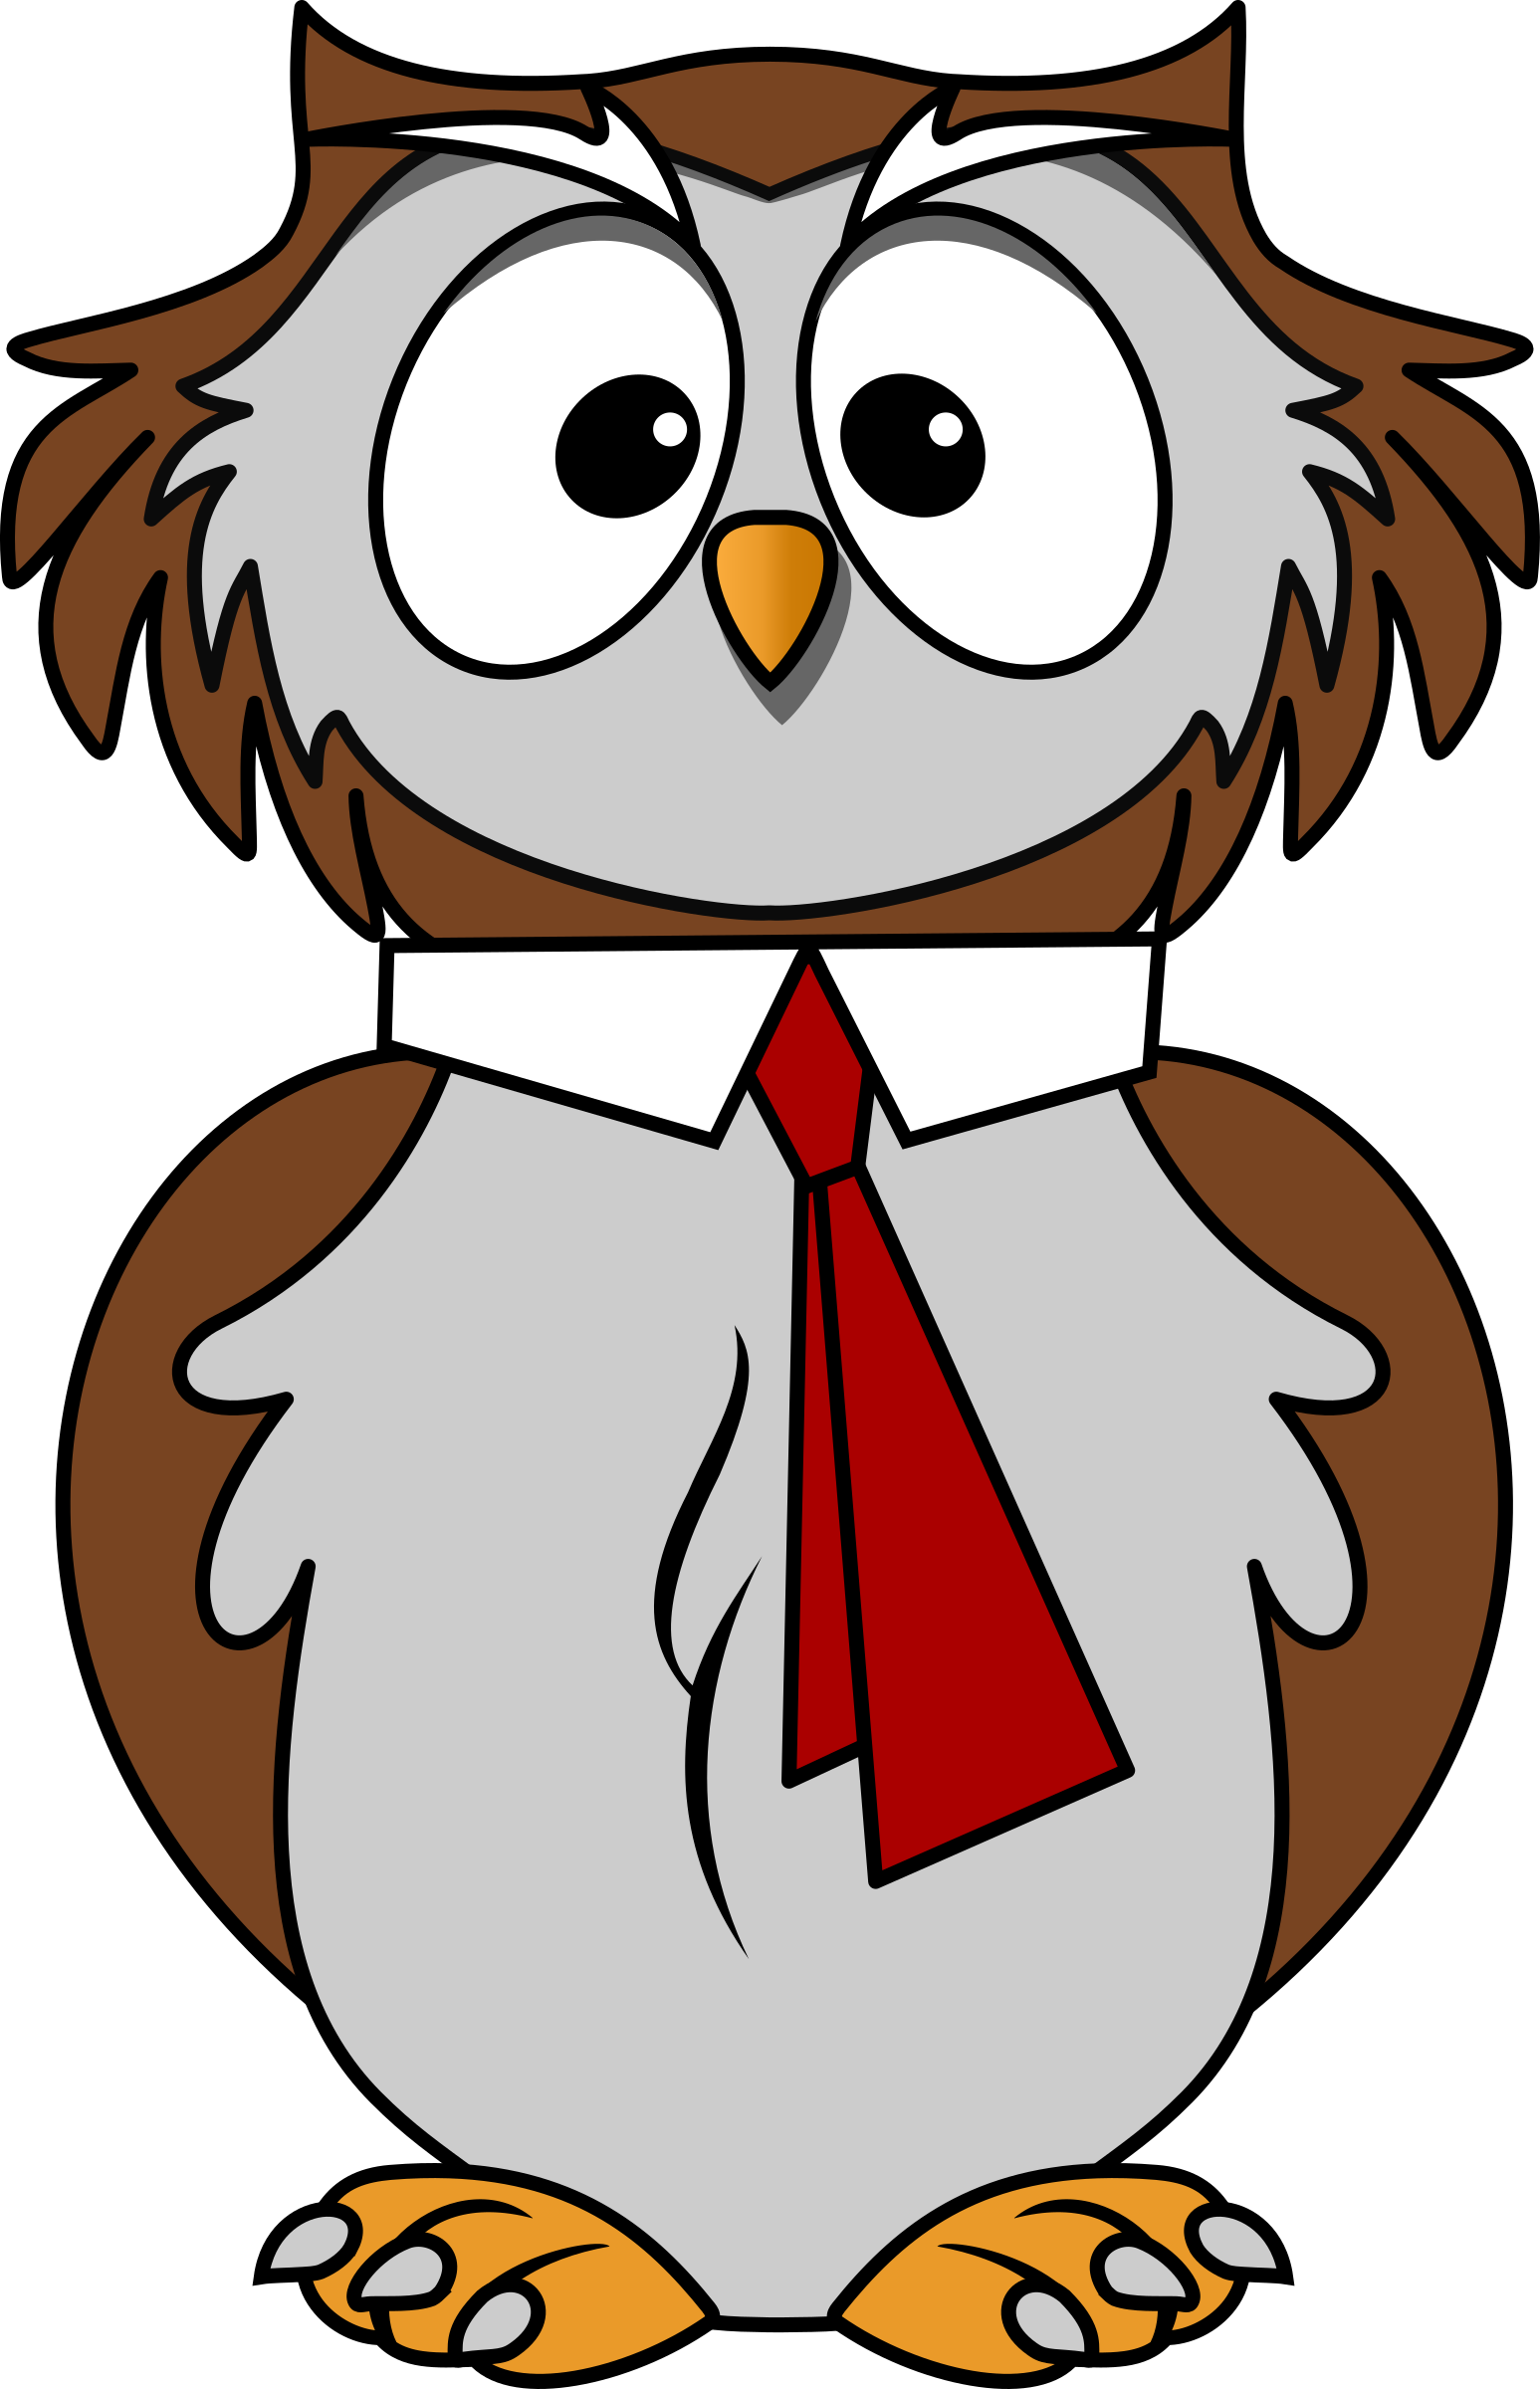 Cute at getdrawings com. Clipart school owl